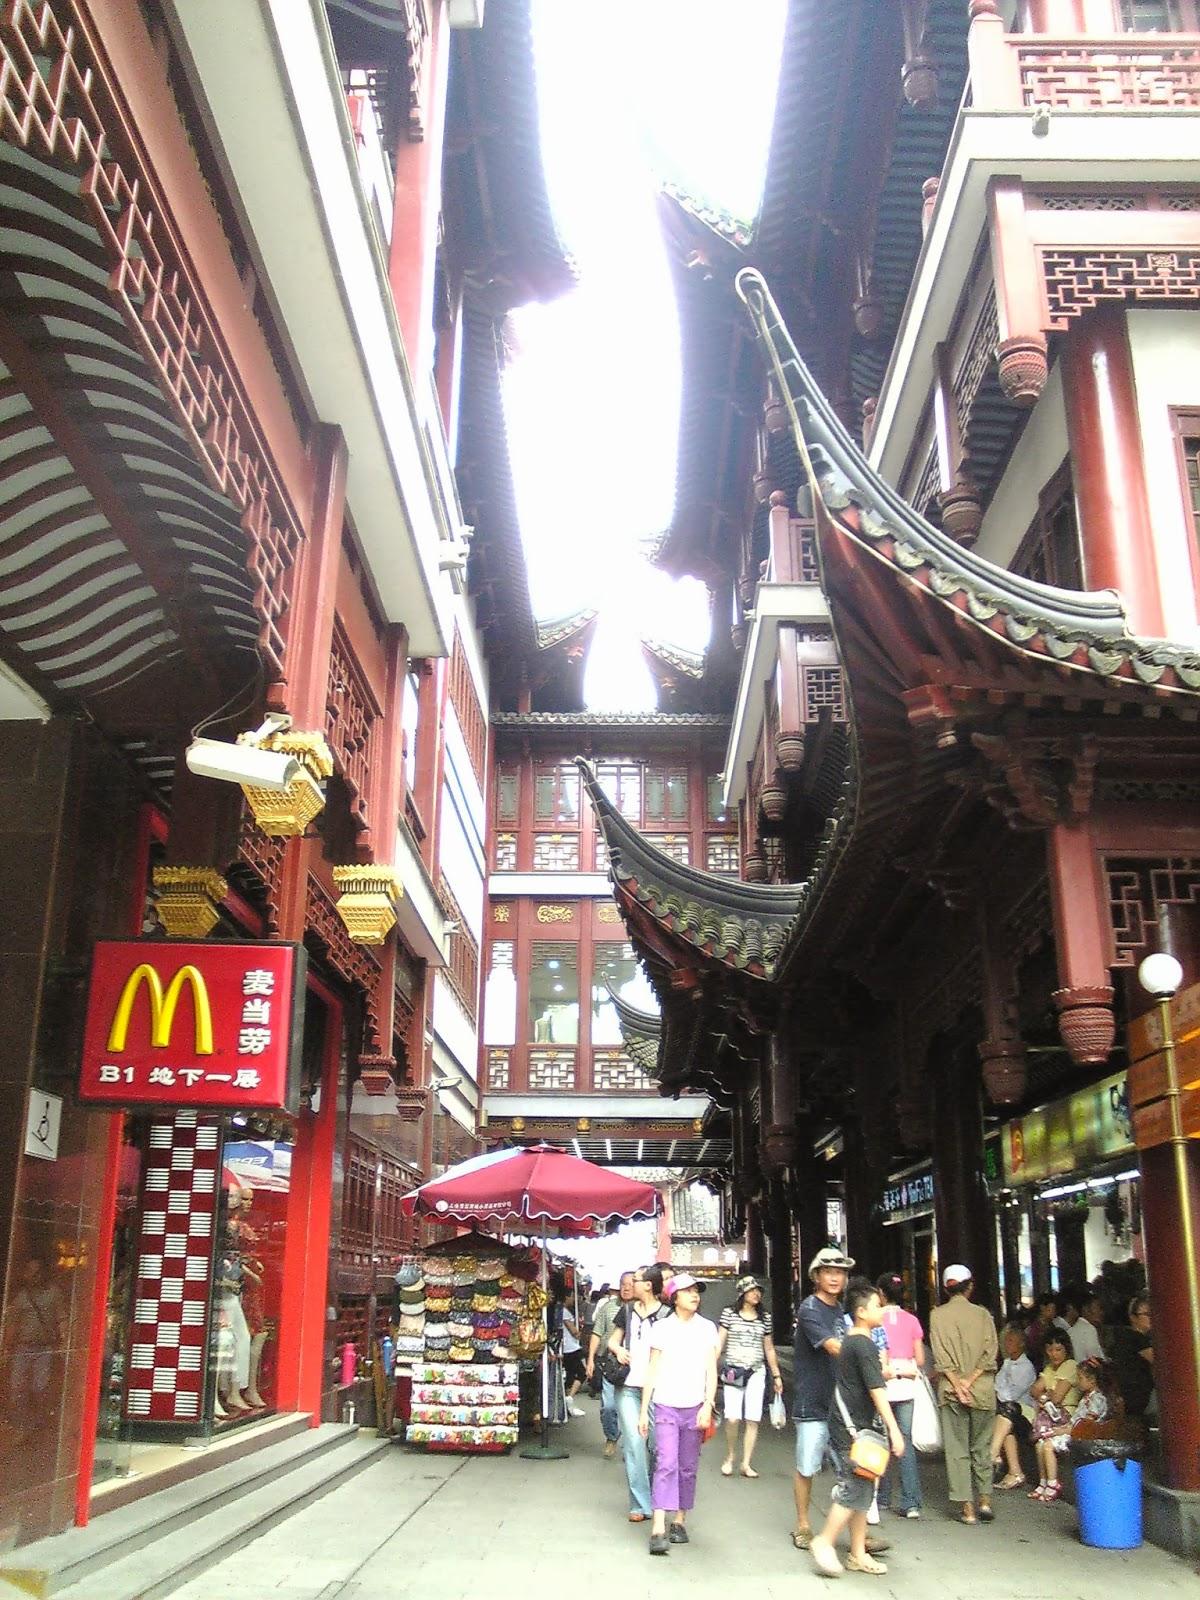 yu garden yuyuan map walk along shanghai old street shanghai laojie to the very touristy yuyuan garden and have some